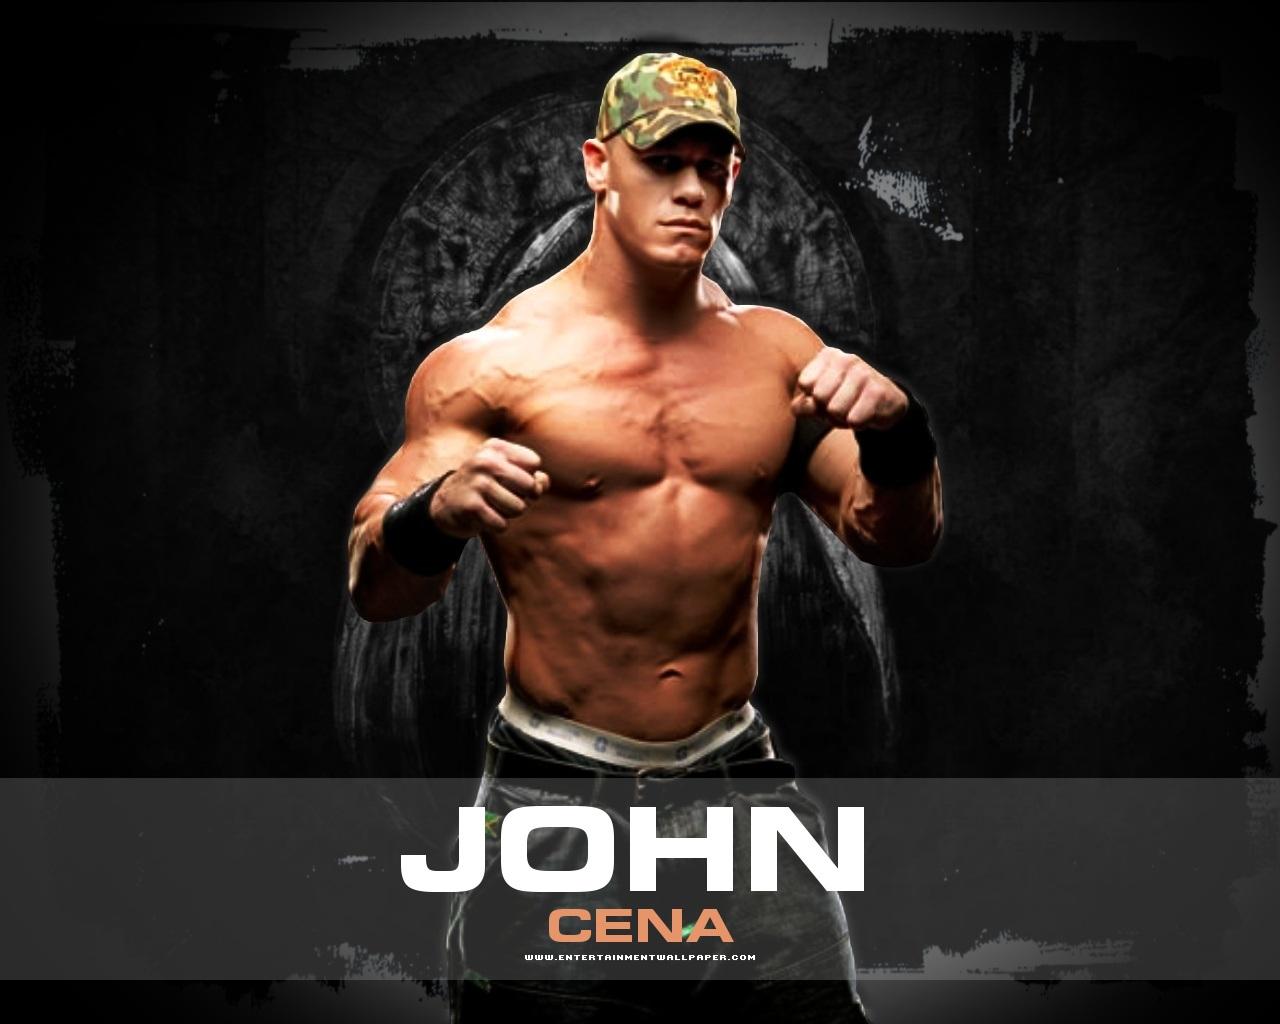 John Cena Still Image Photo Picture Wallpaper